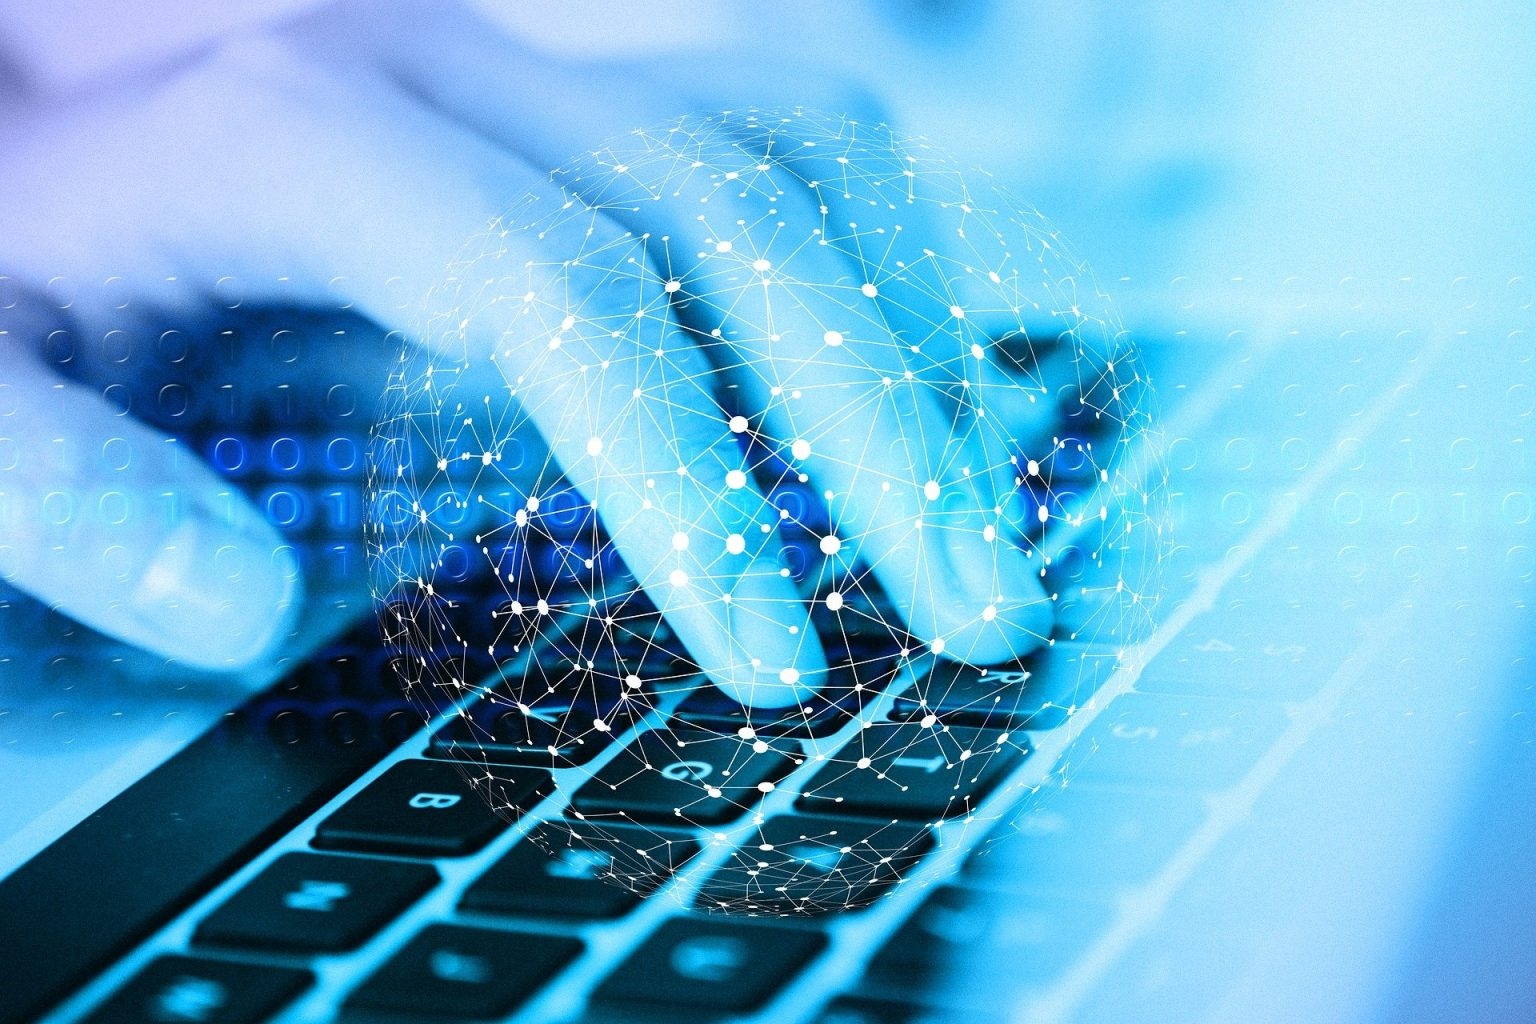 fido-open-iot-internet-of-things-standard-security-infosec-cybersecurity-1536x1024.jpg (277 KB)